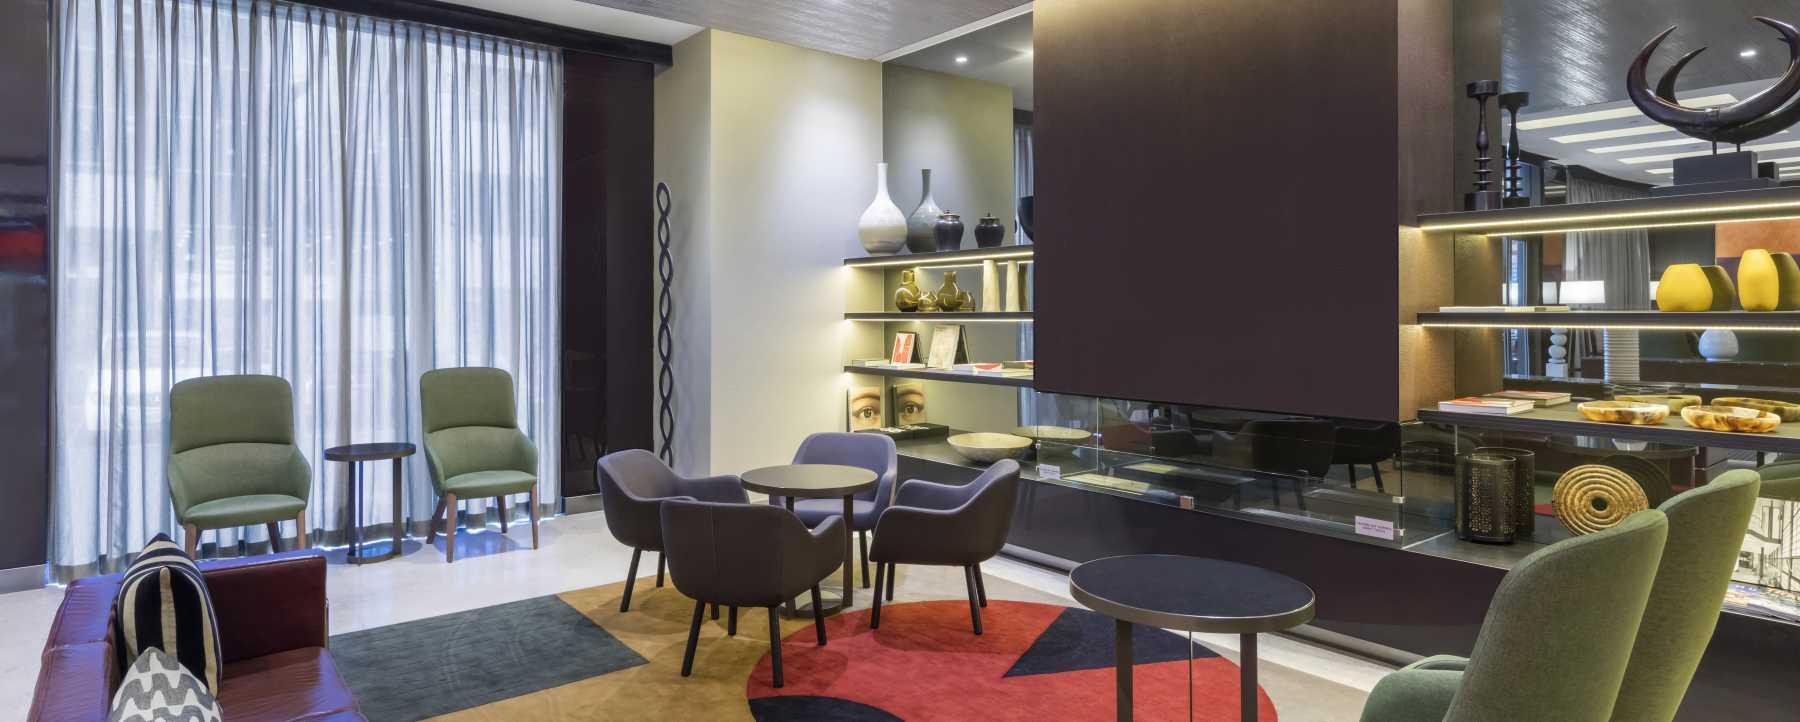 Adina Apartment Hotel Melbourne Lobby